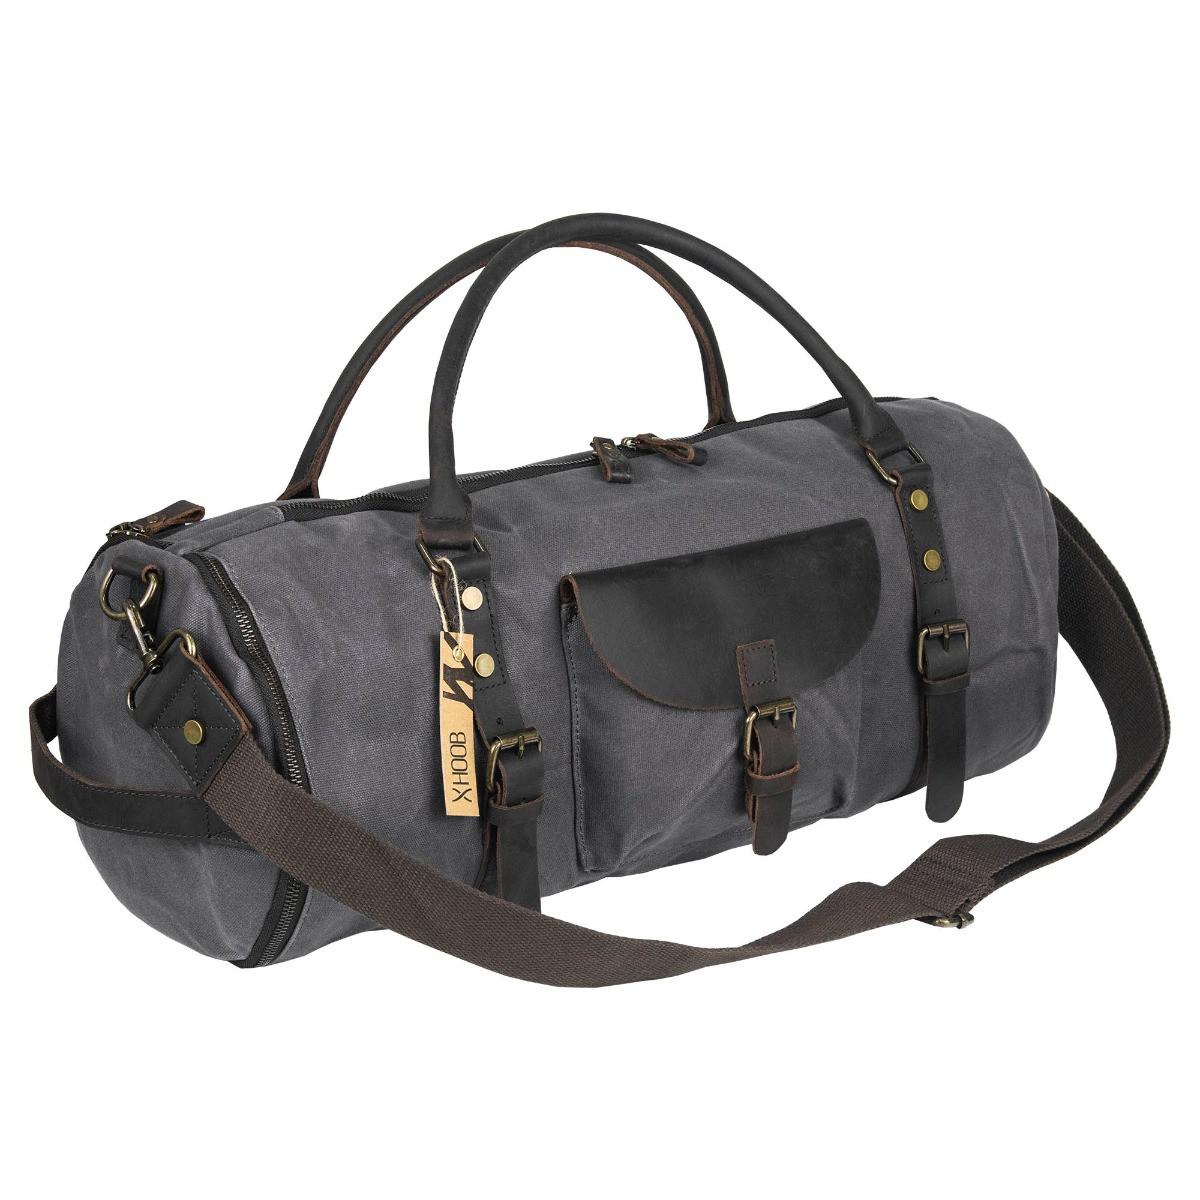 Hoob Mini Bag   For Compact Hookahs